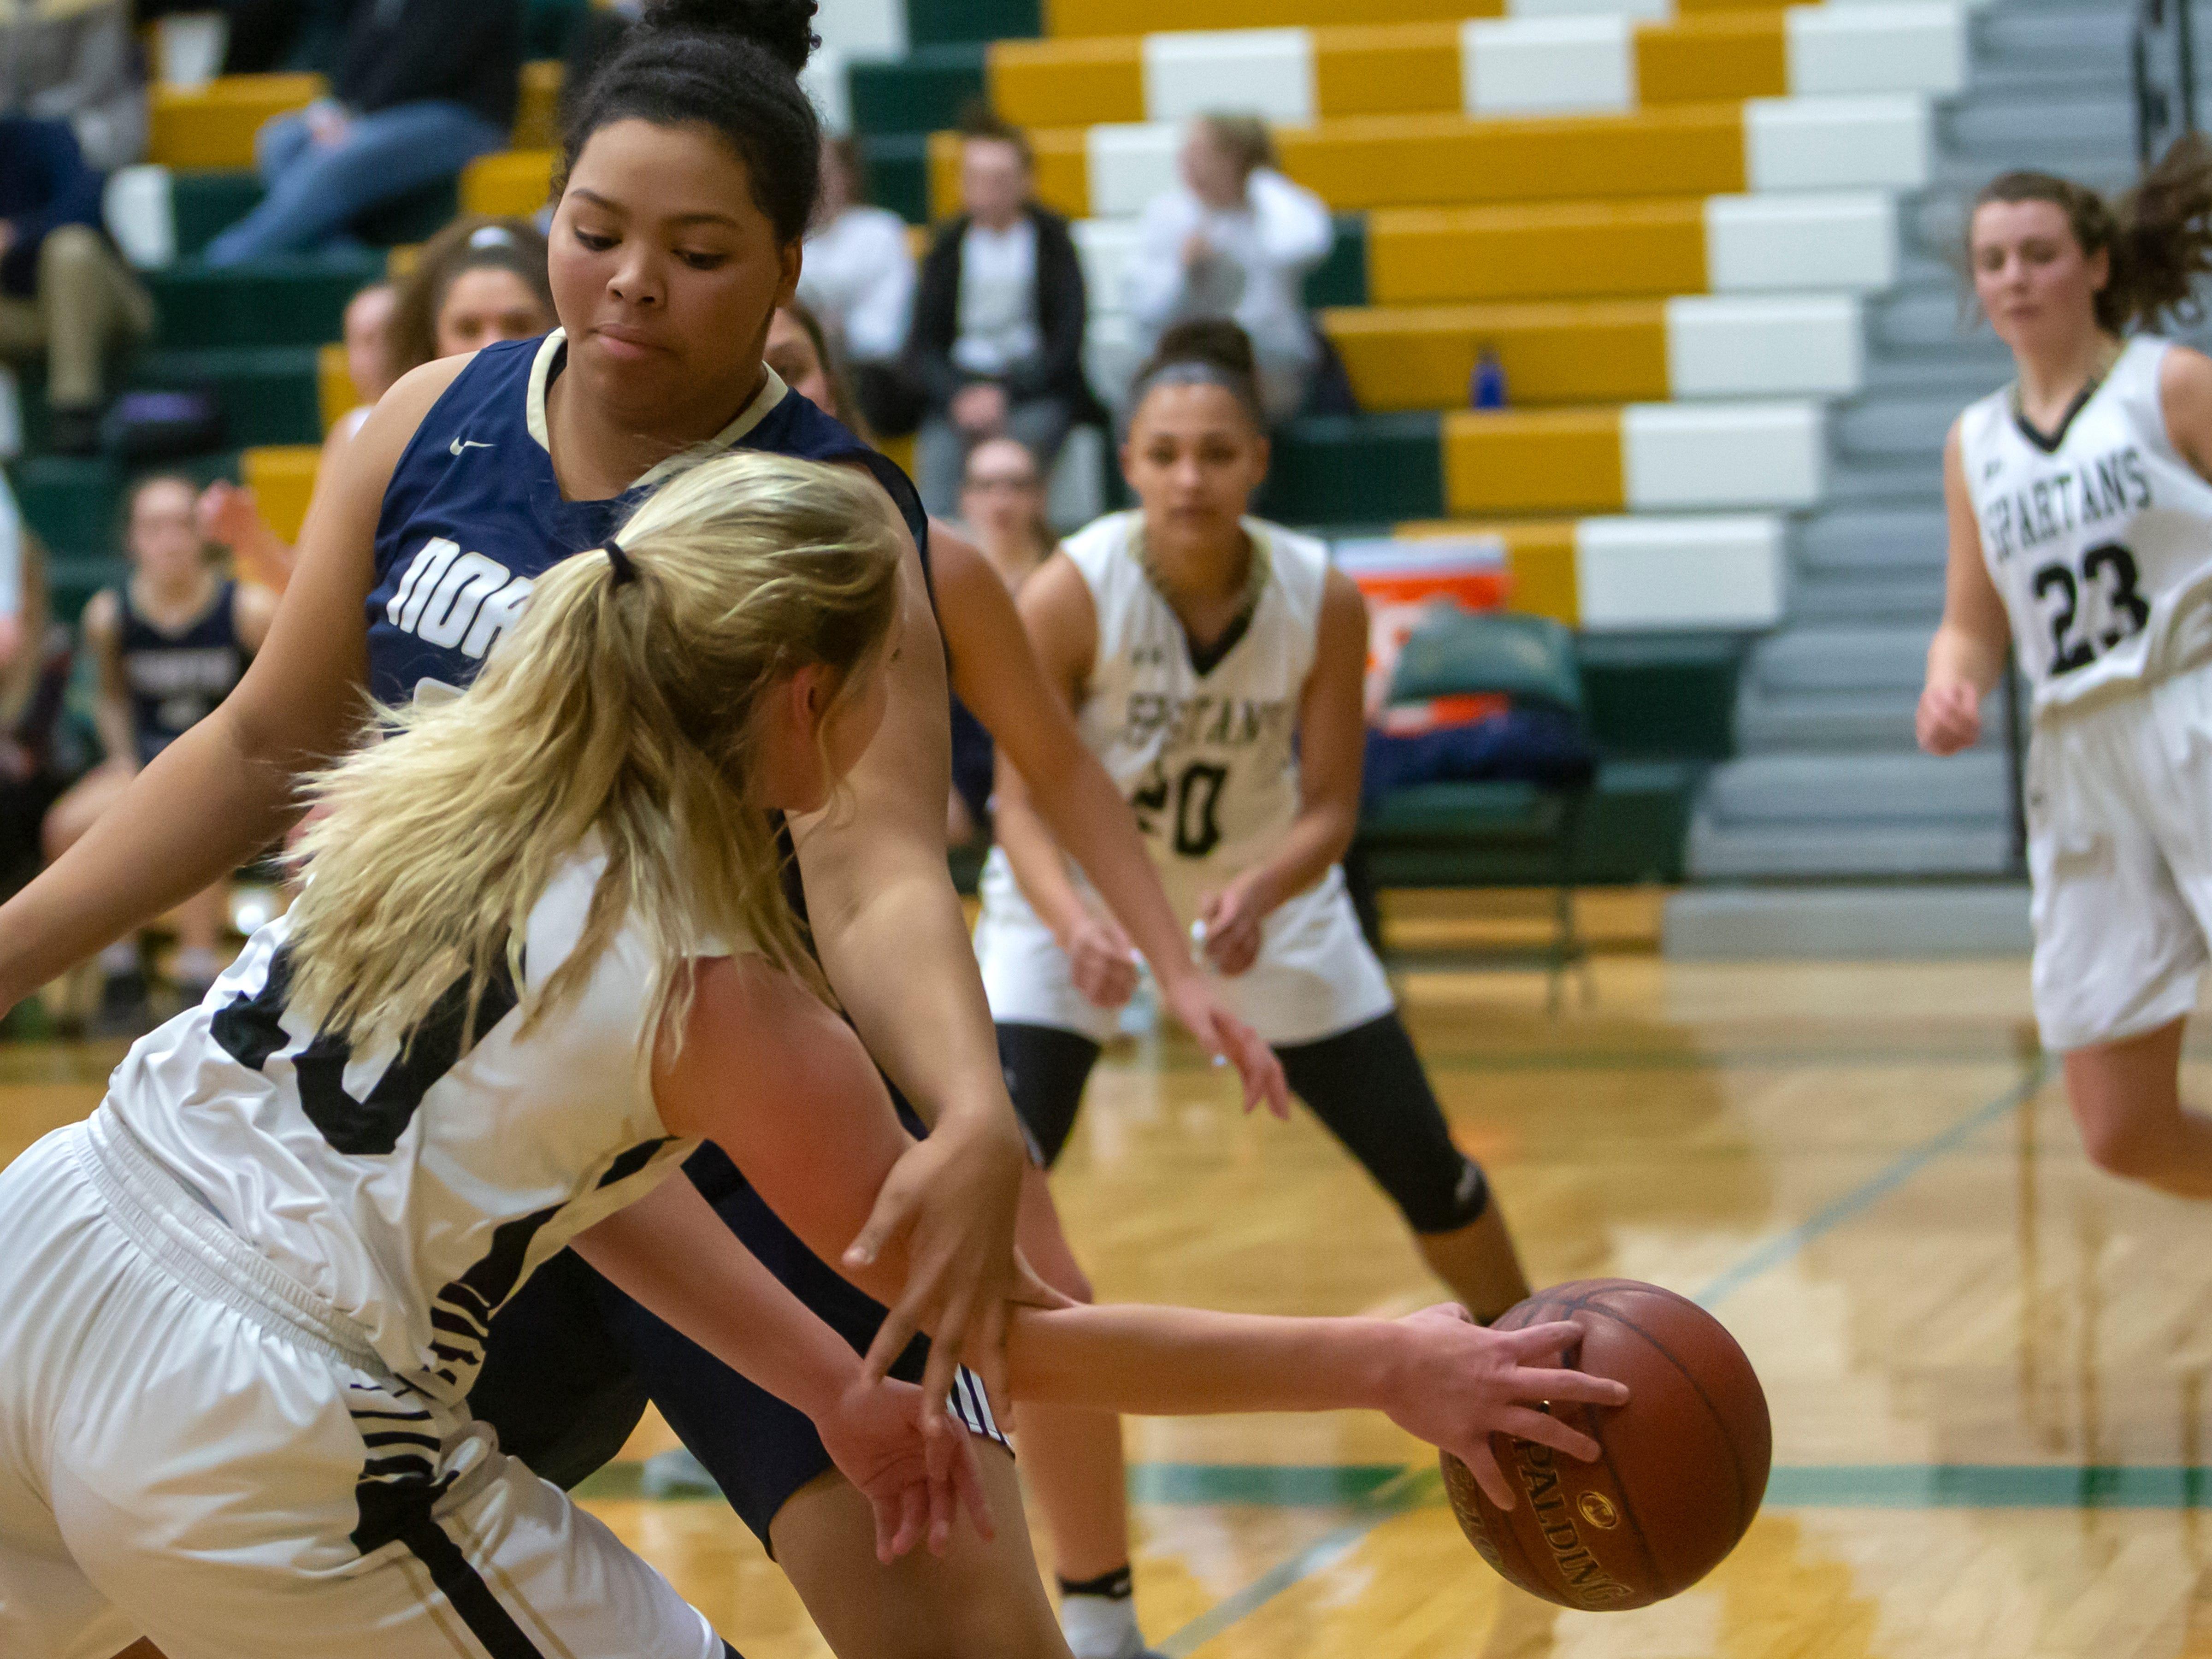 Appleton North's Makayla White attempts to block a pass by Oshkosh North's Brooke Ellestad at a girls basketball game Friday, February 8, 2019, in Oshkosh, Wis., at Oshkosh North High School.